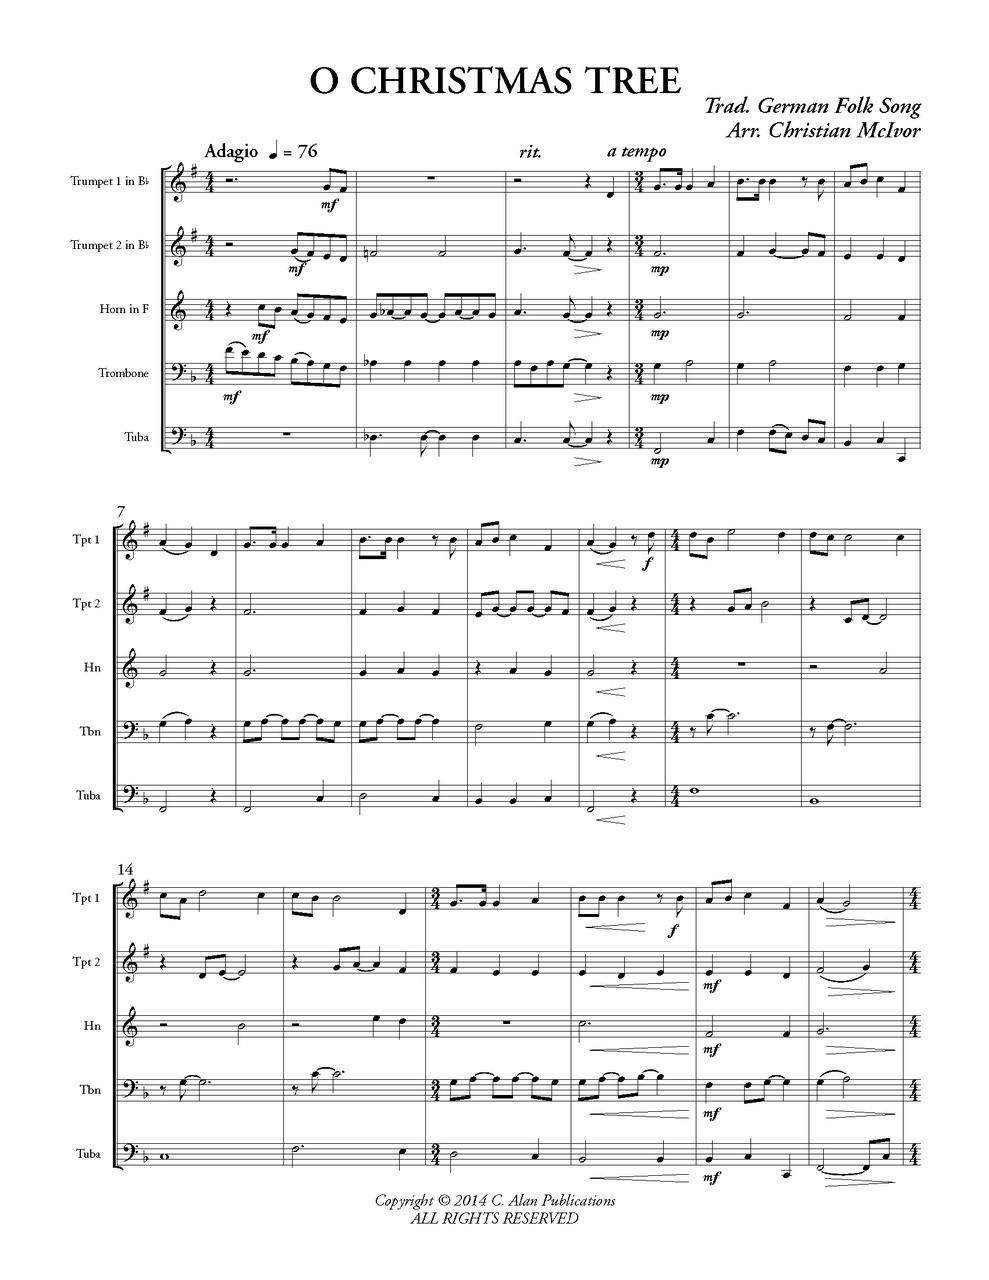 o christmas tree sheet music - Heart.impulsar.co